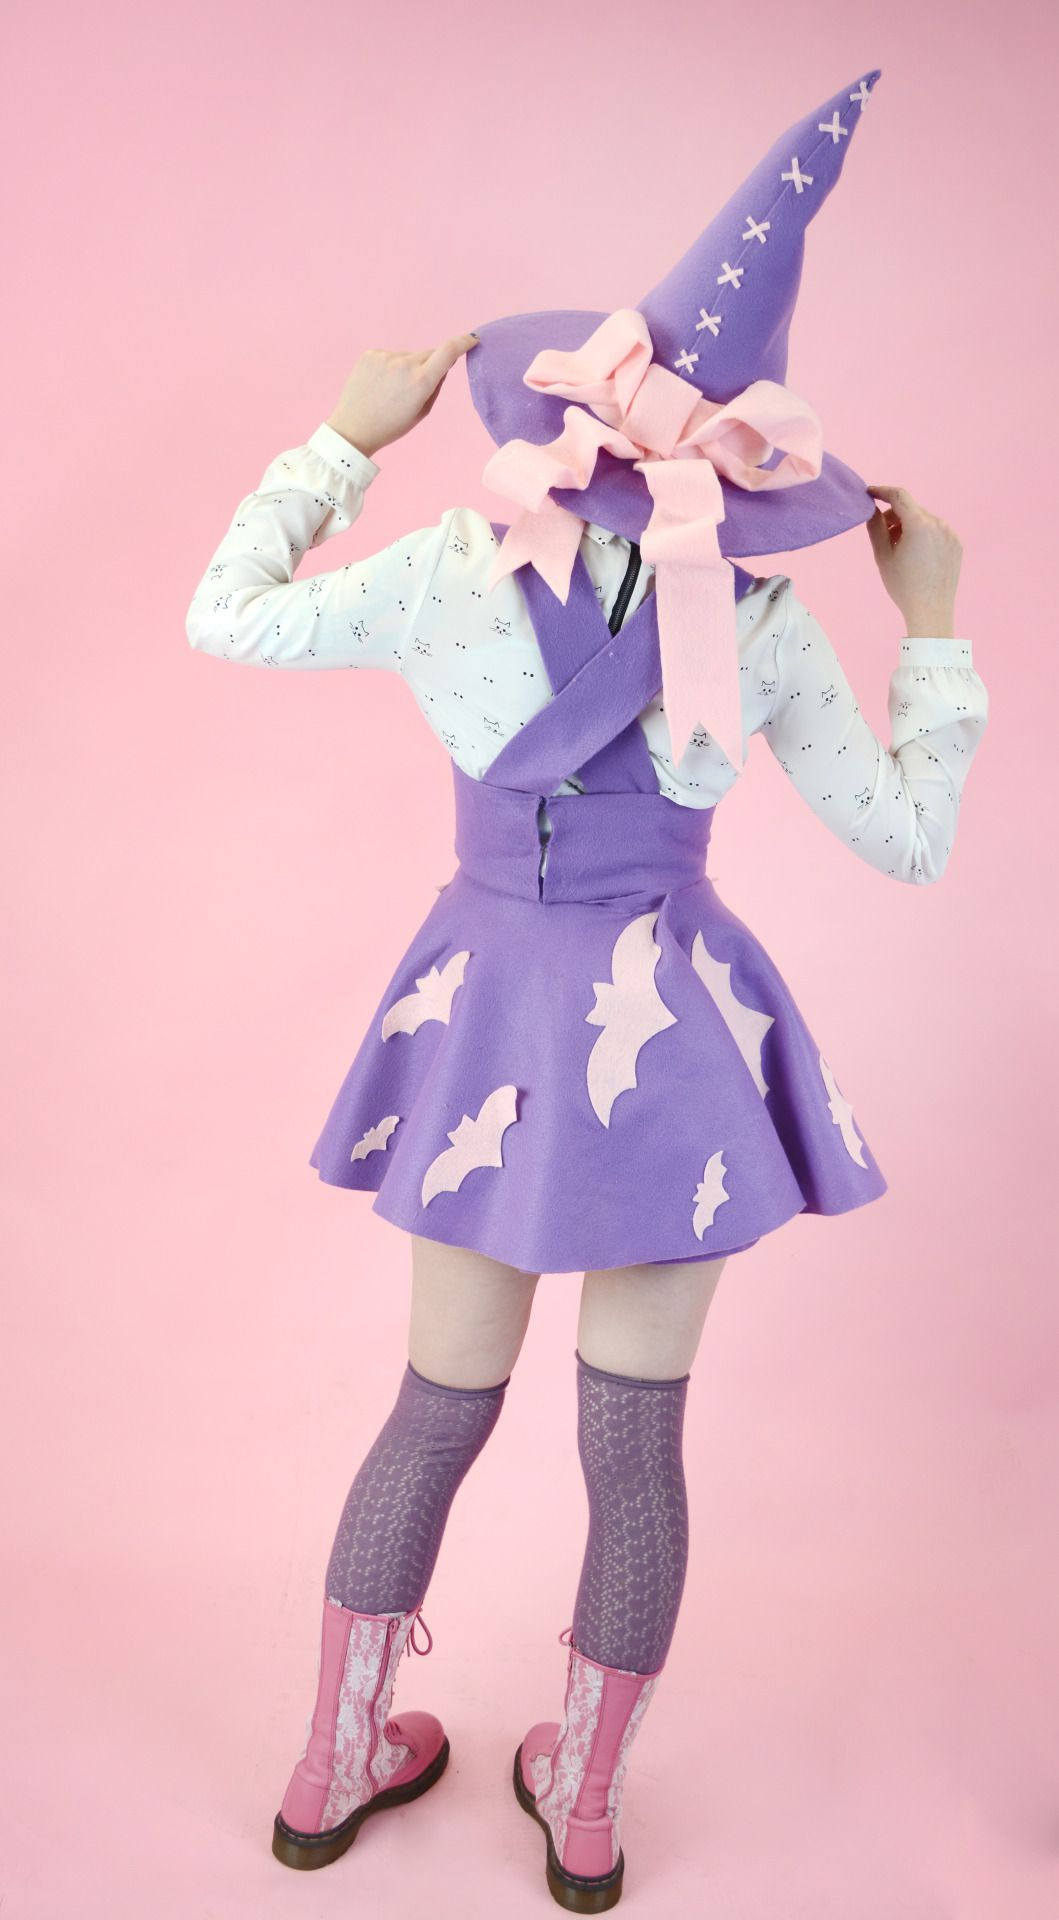 Arseniccupcakes u hnyskle misswynn my halloween costume